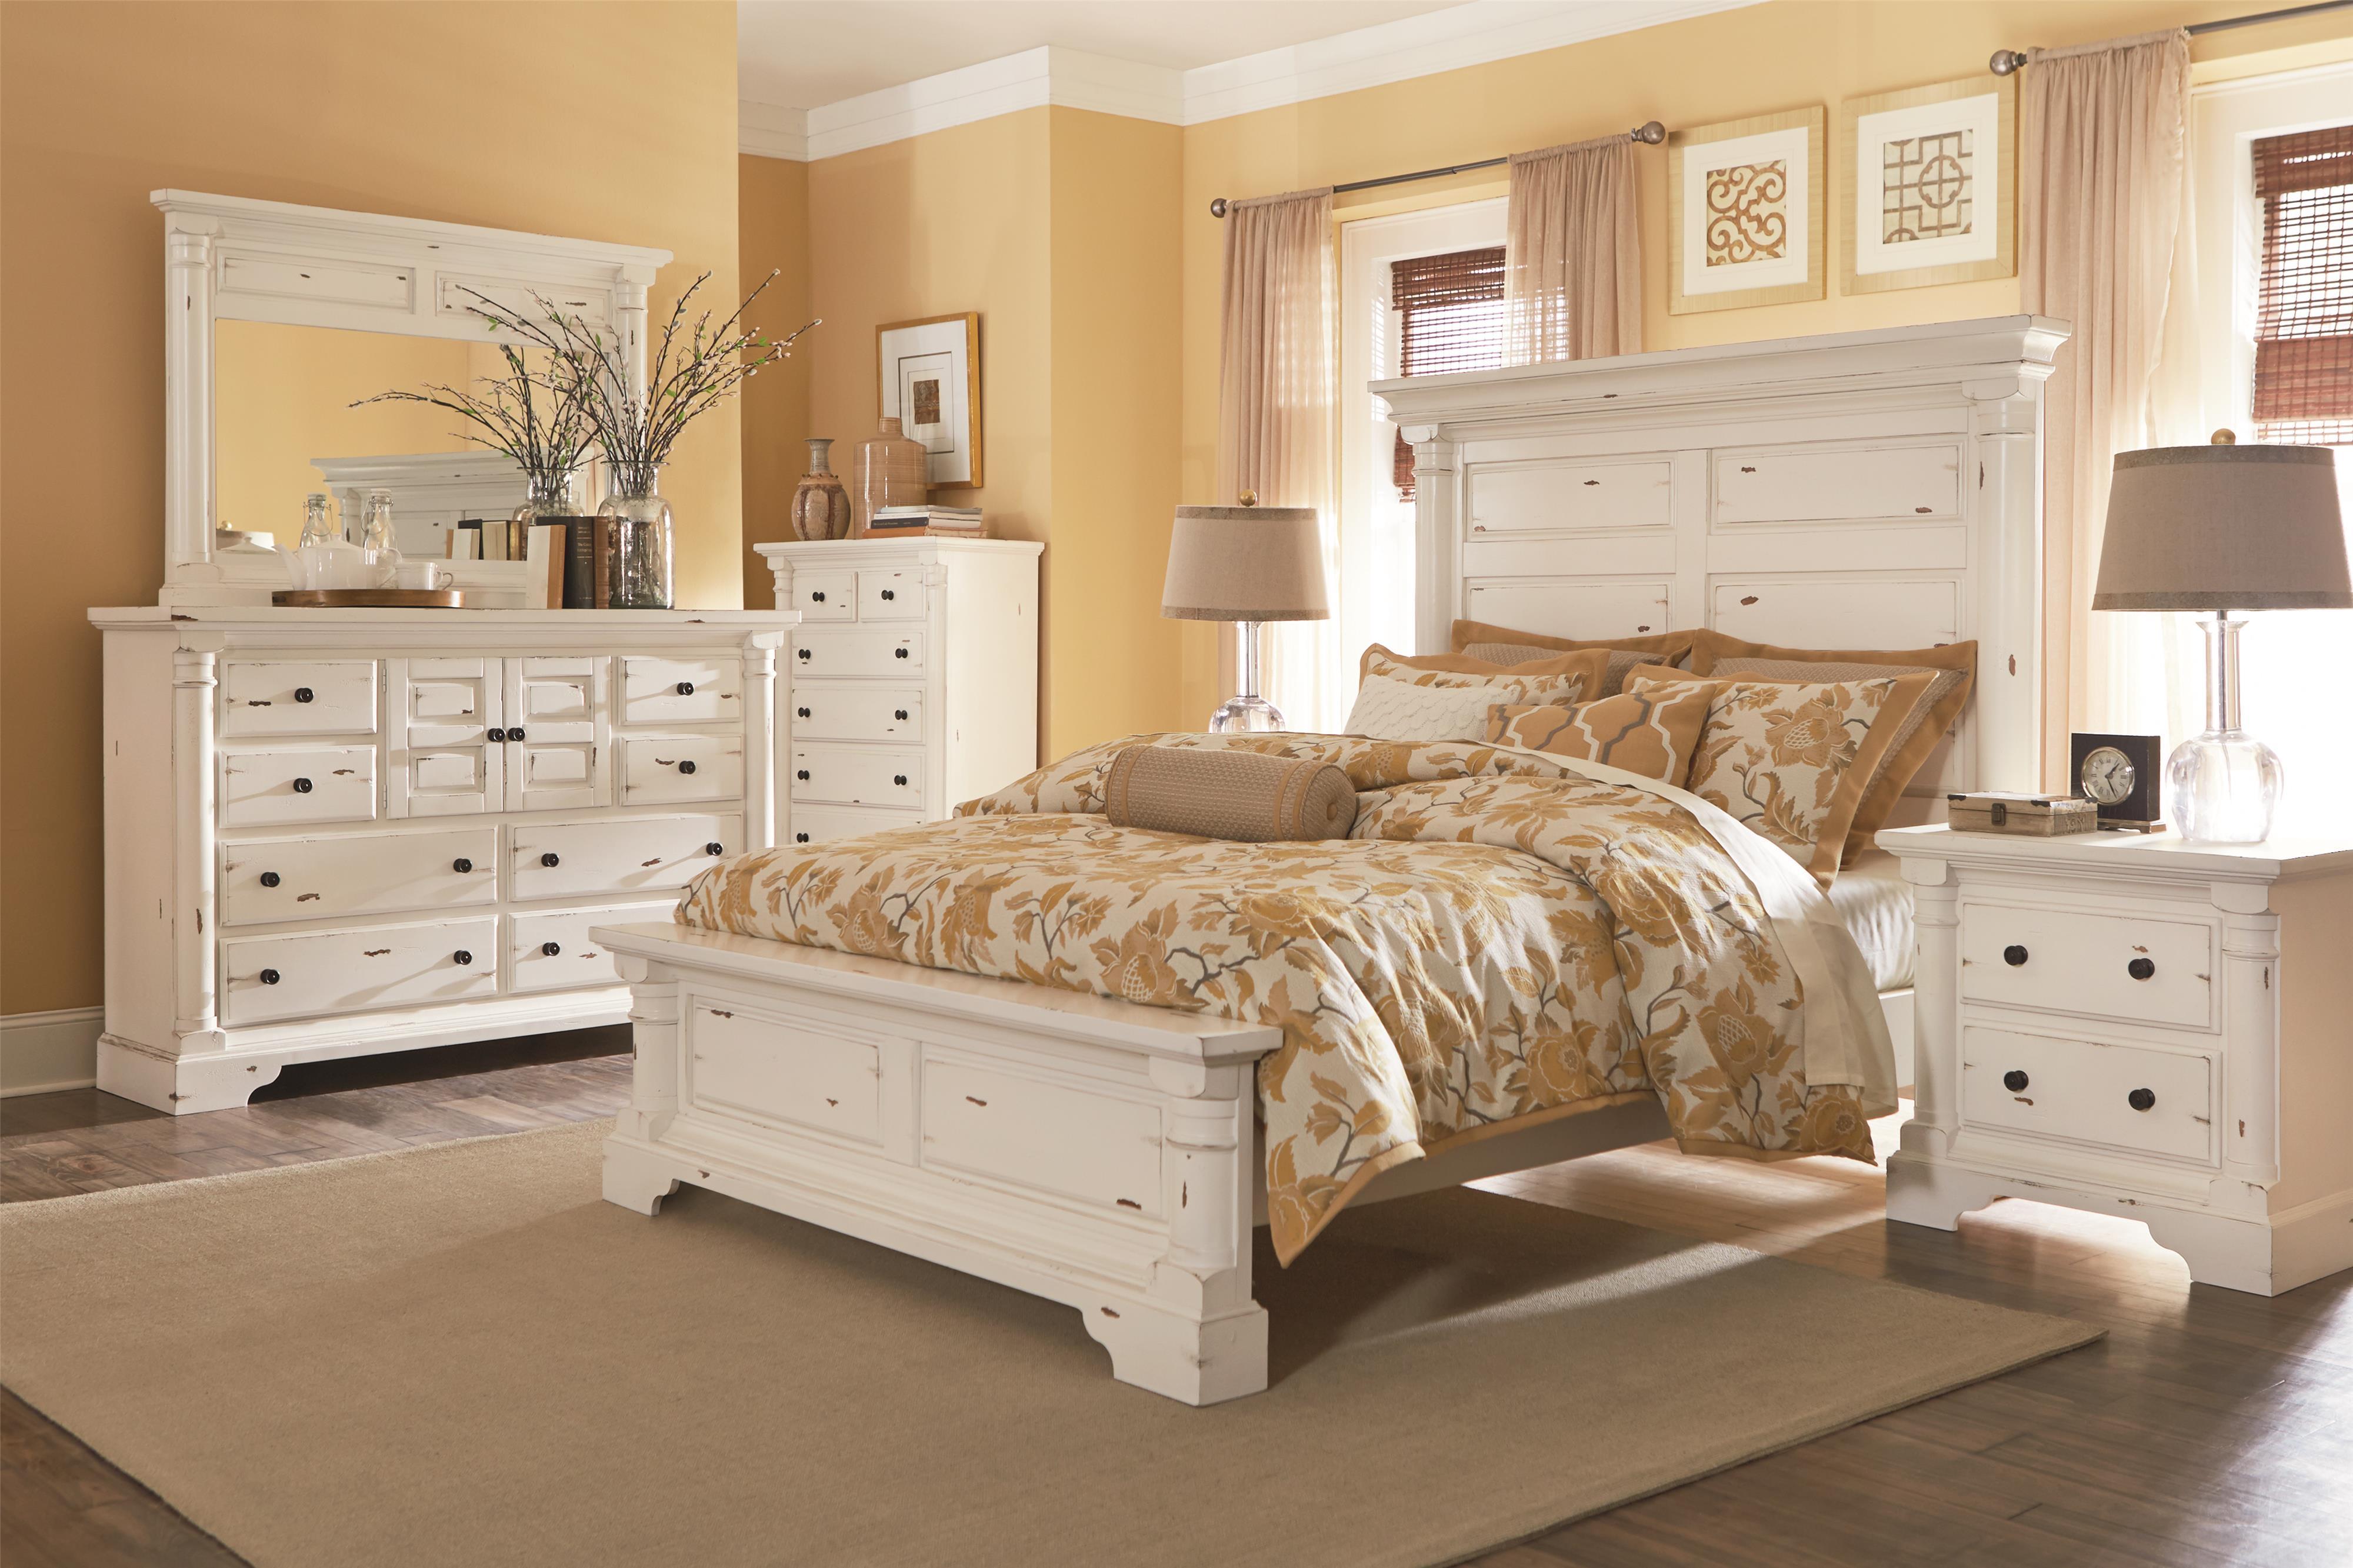 Progressive Furniture Gramercy Park King Bedroom Group Hudson 39 S Furniture Bedroom Groups